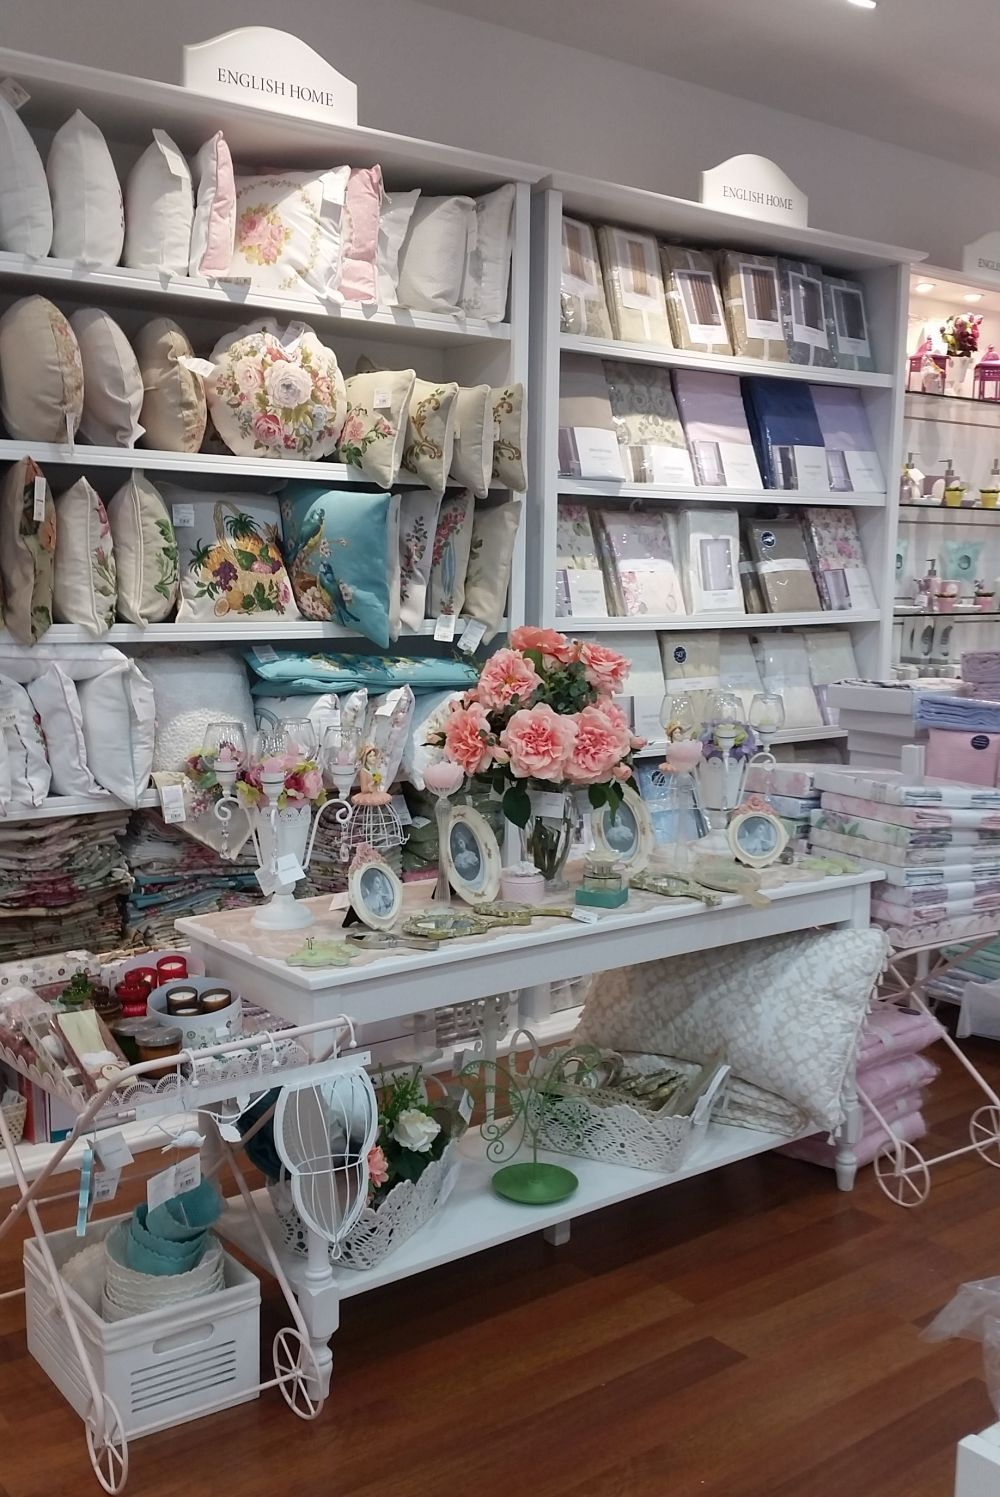 adelaparvu.com despre Bucuresti Mall, Mall Vitan, magazinul English Home (15)